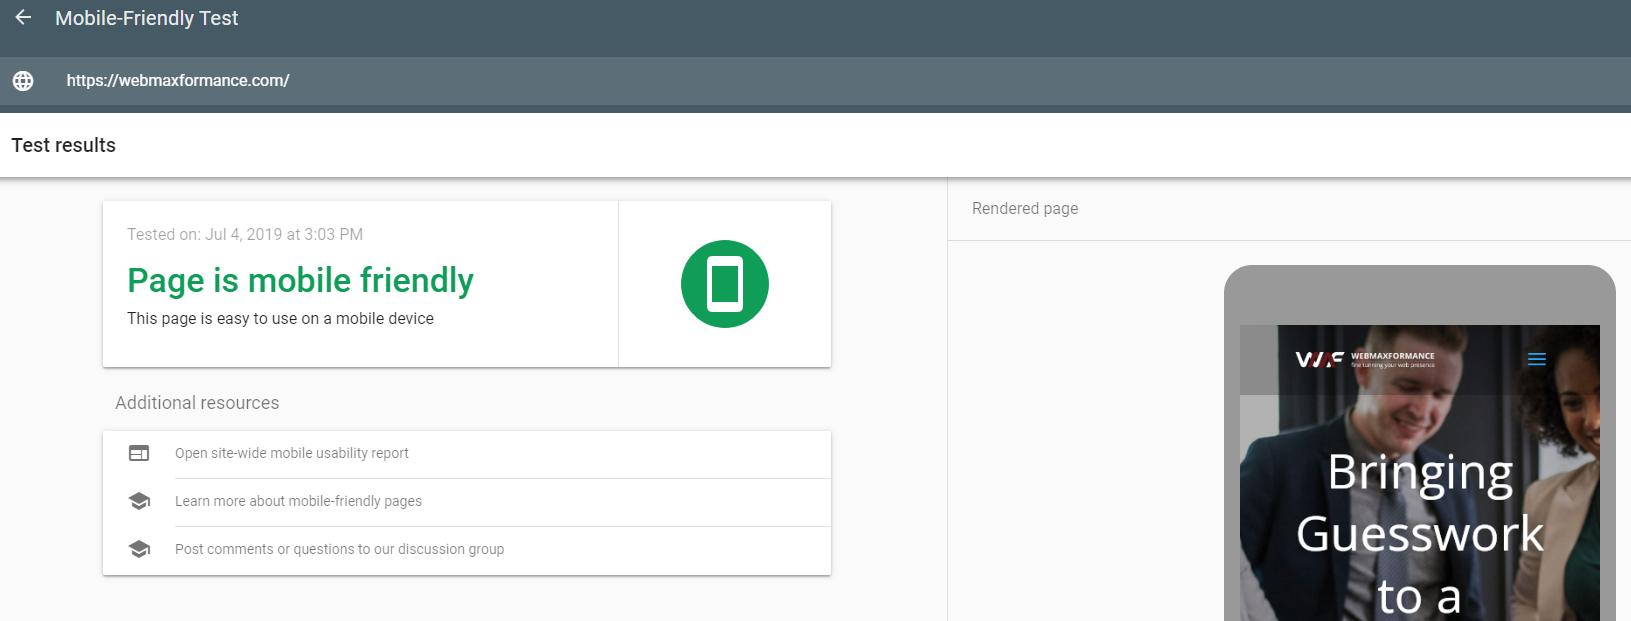 mobile-friendly-test-webmax